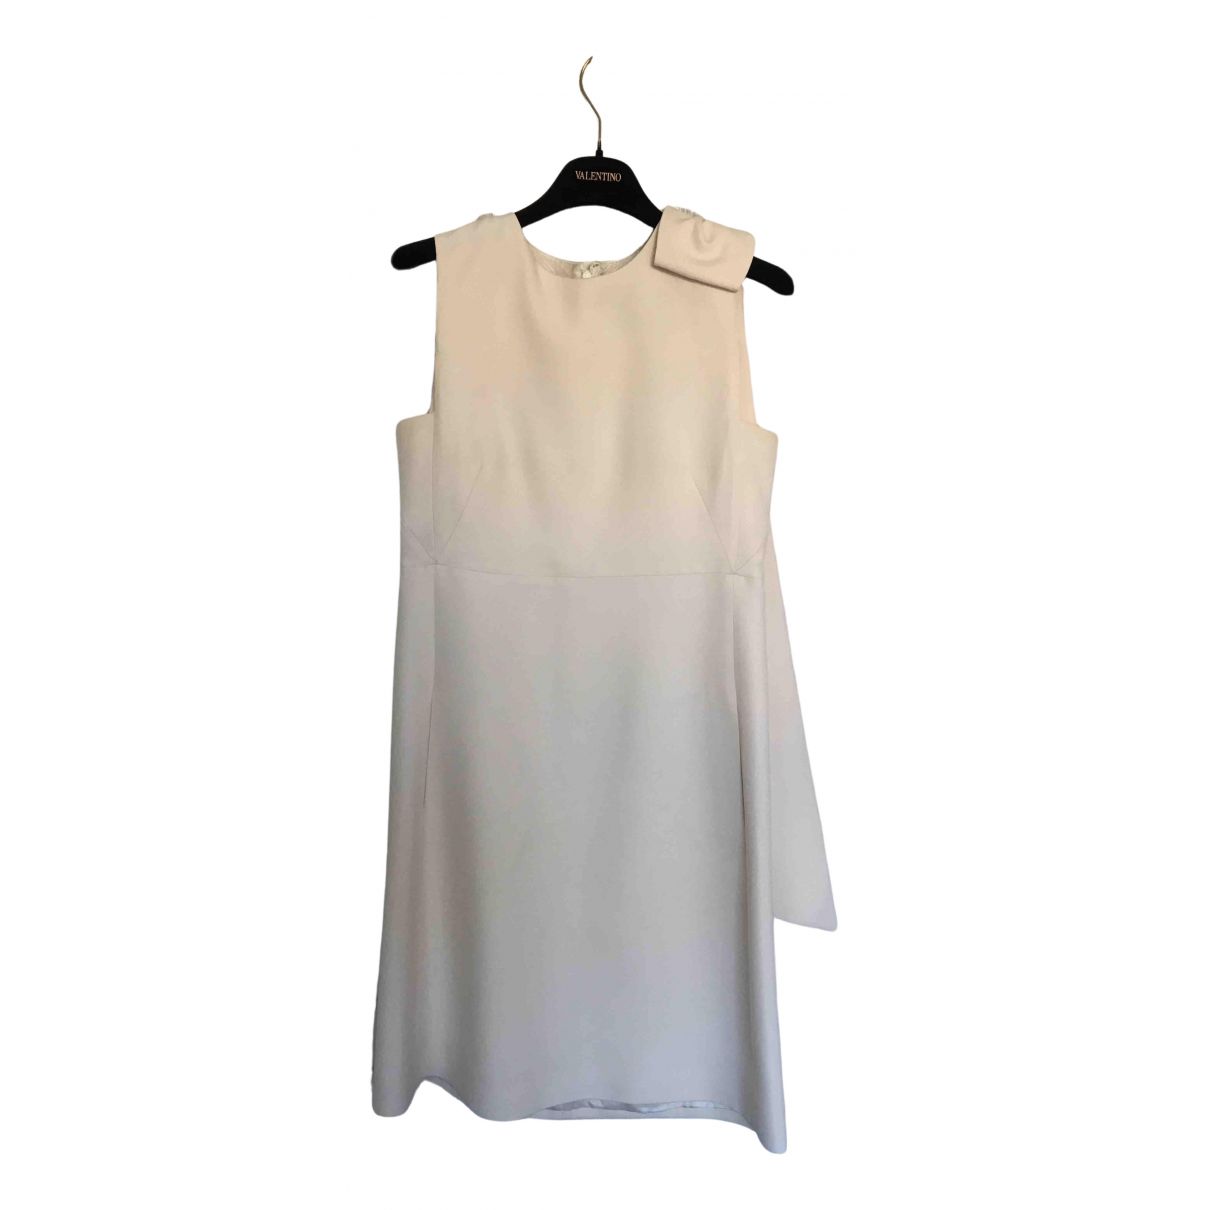 Valentino Garavani \N Kleid in  Ecru Wolle